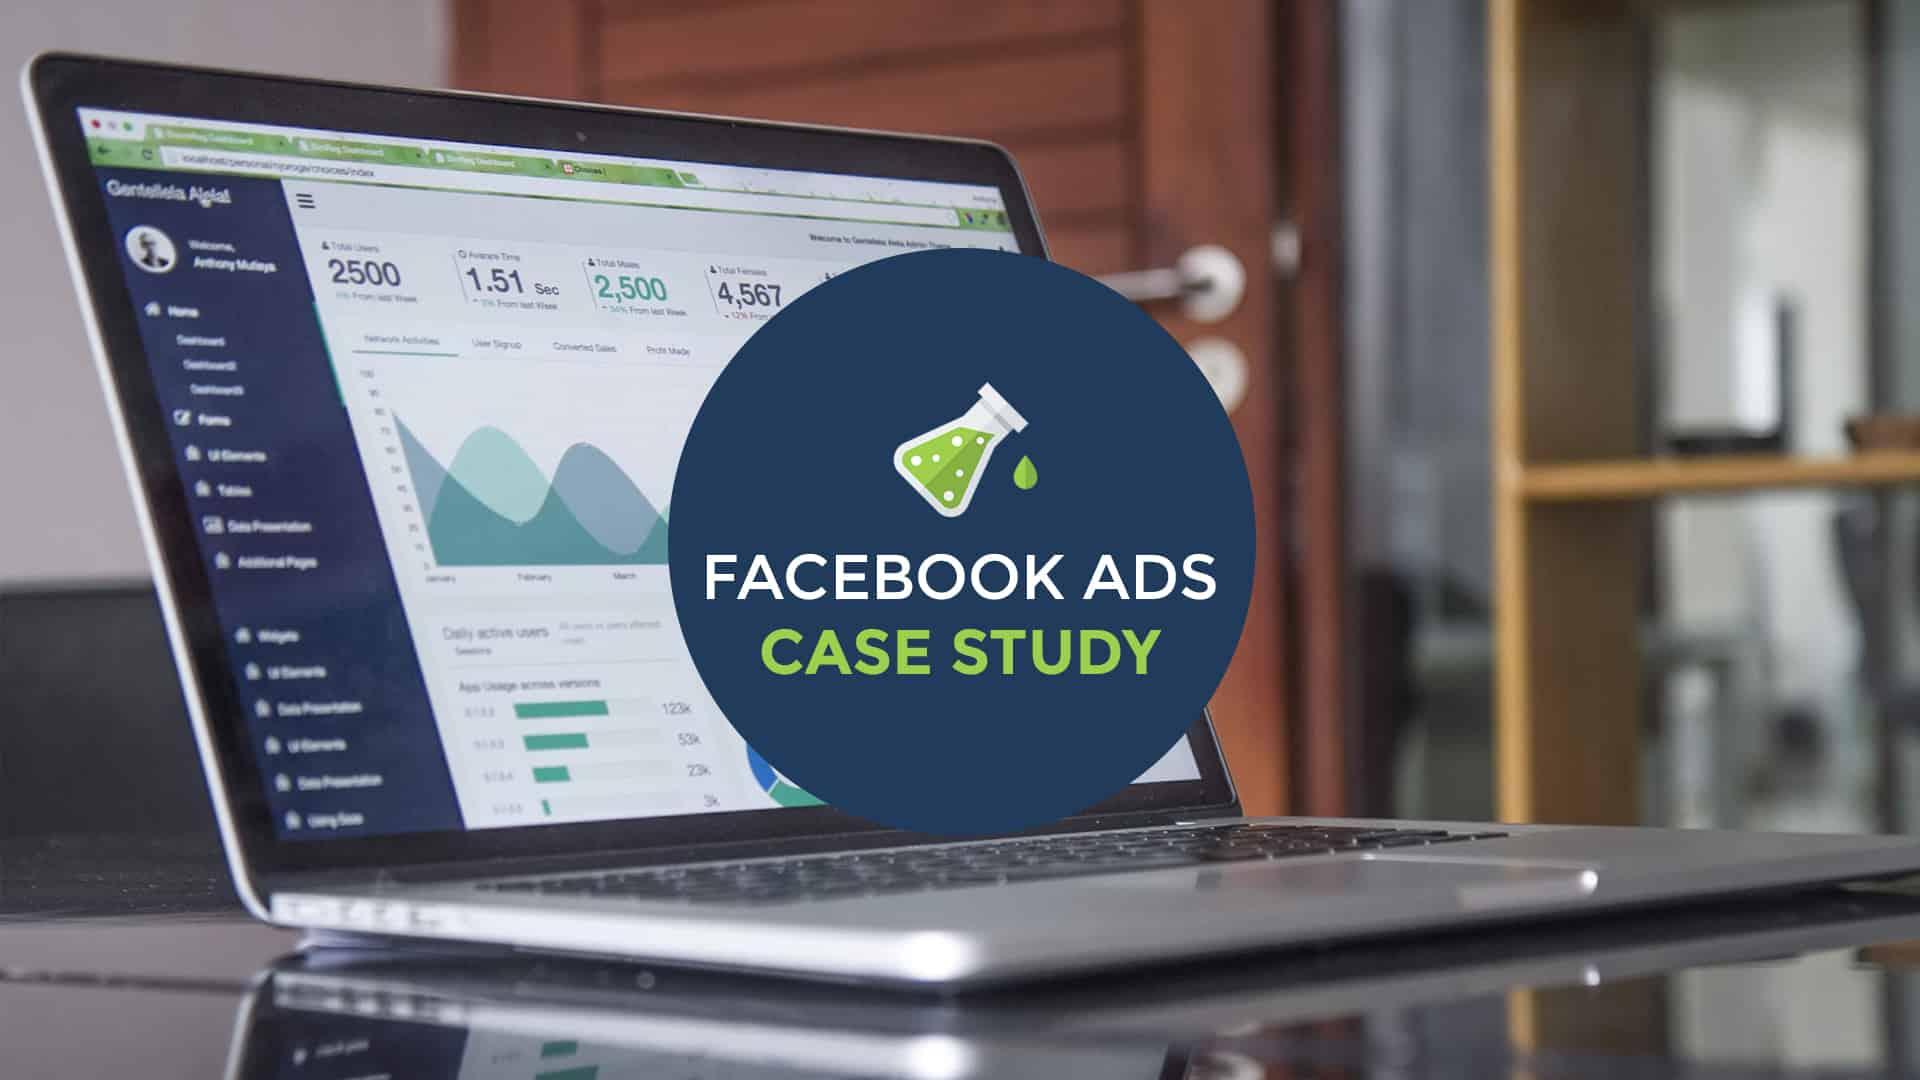 Facebook Ads Case Study 2019 - 400% ROI Campaign💈